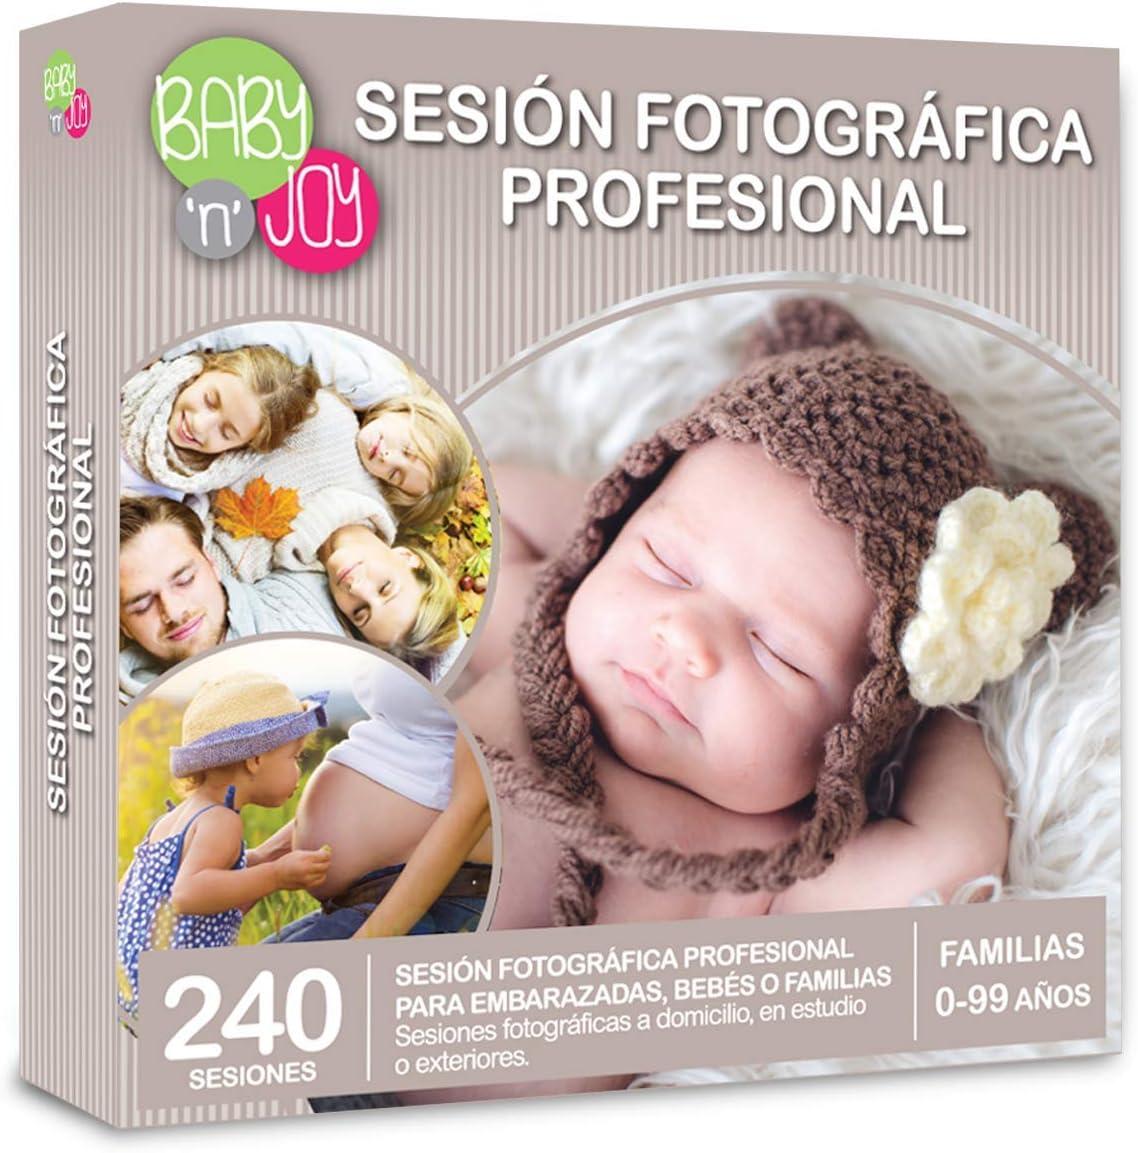 baby n joy sesion fotografica profesional